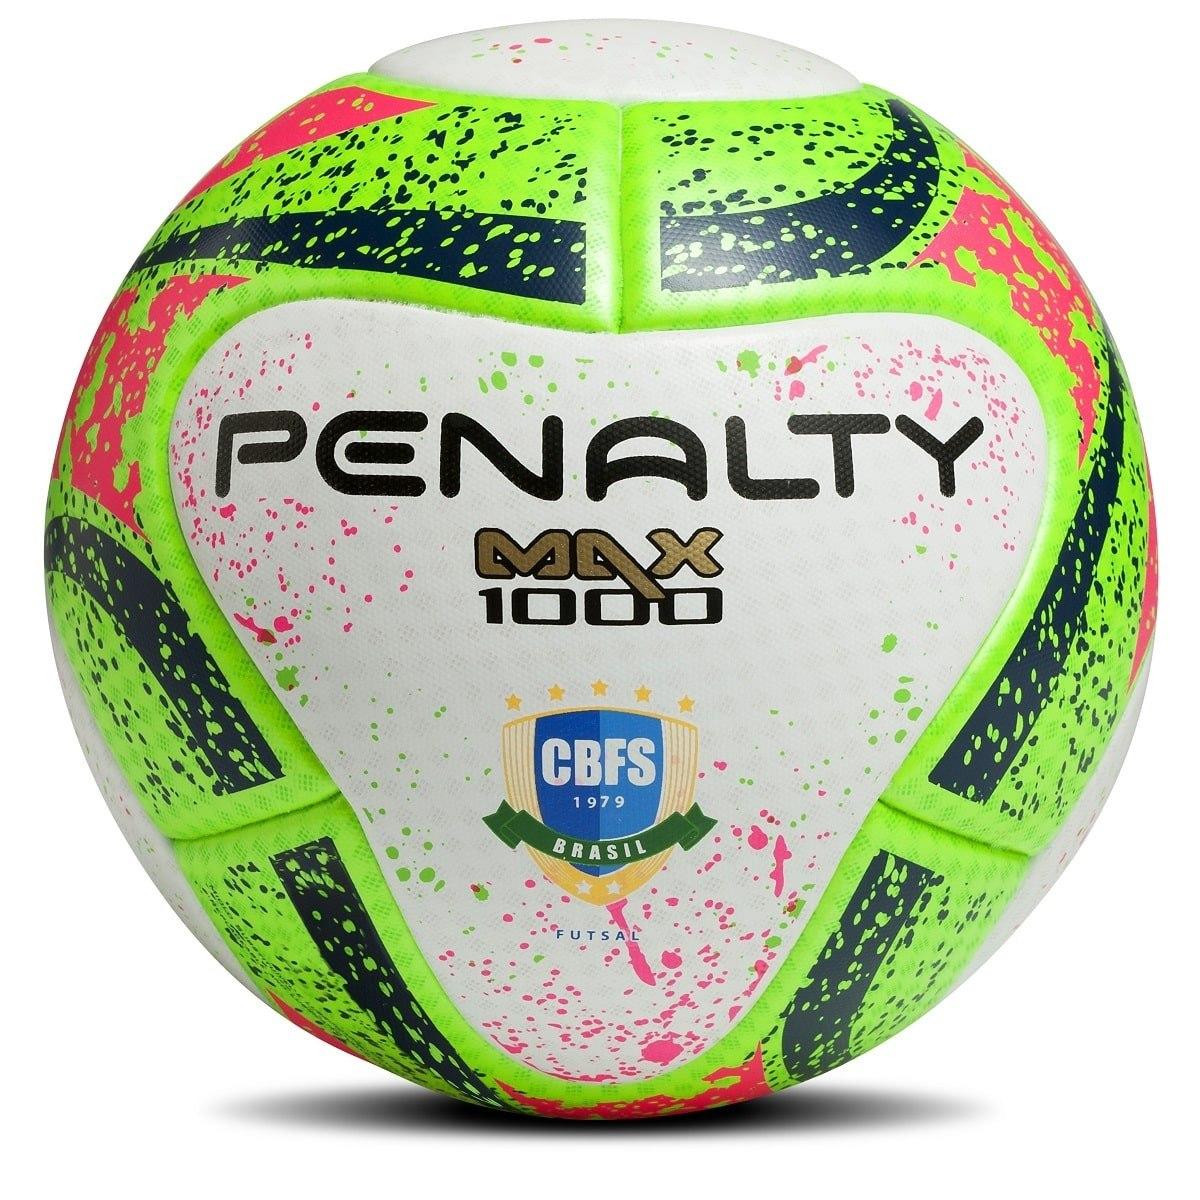 a0ecf0672 bola futsal penalty max 1000 aprovada fifa termotec 2018. Carregando zoom.